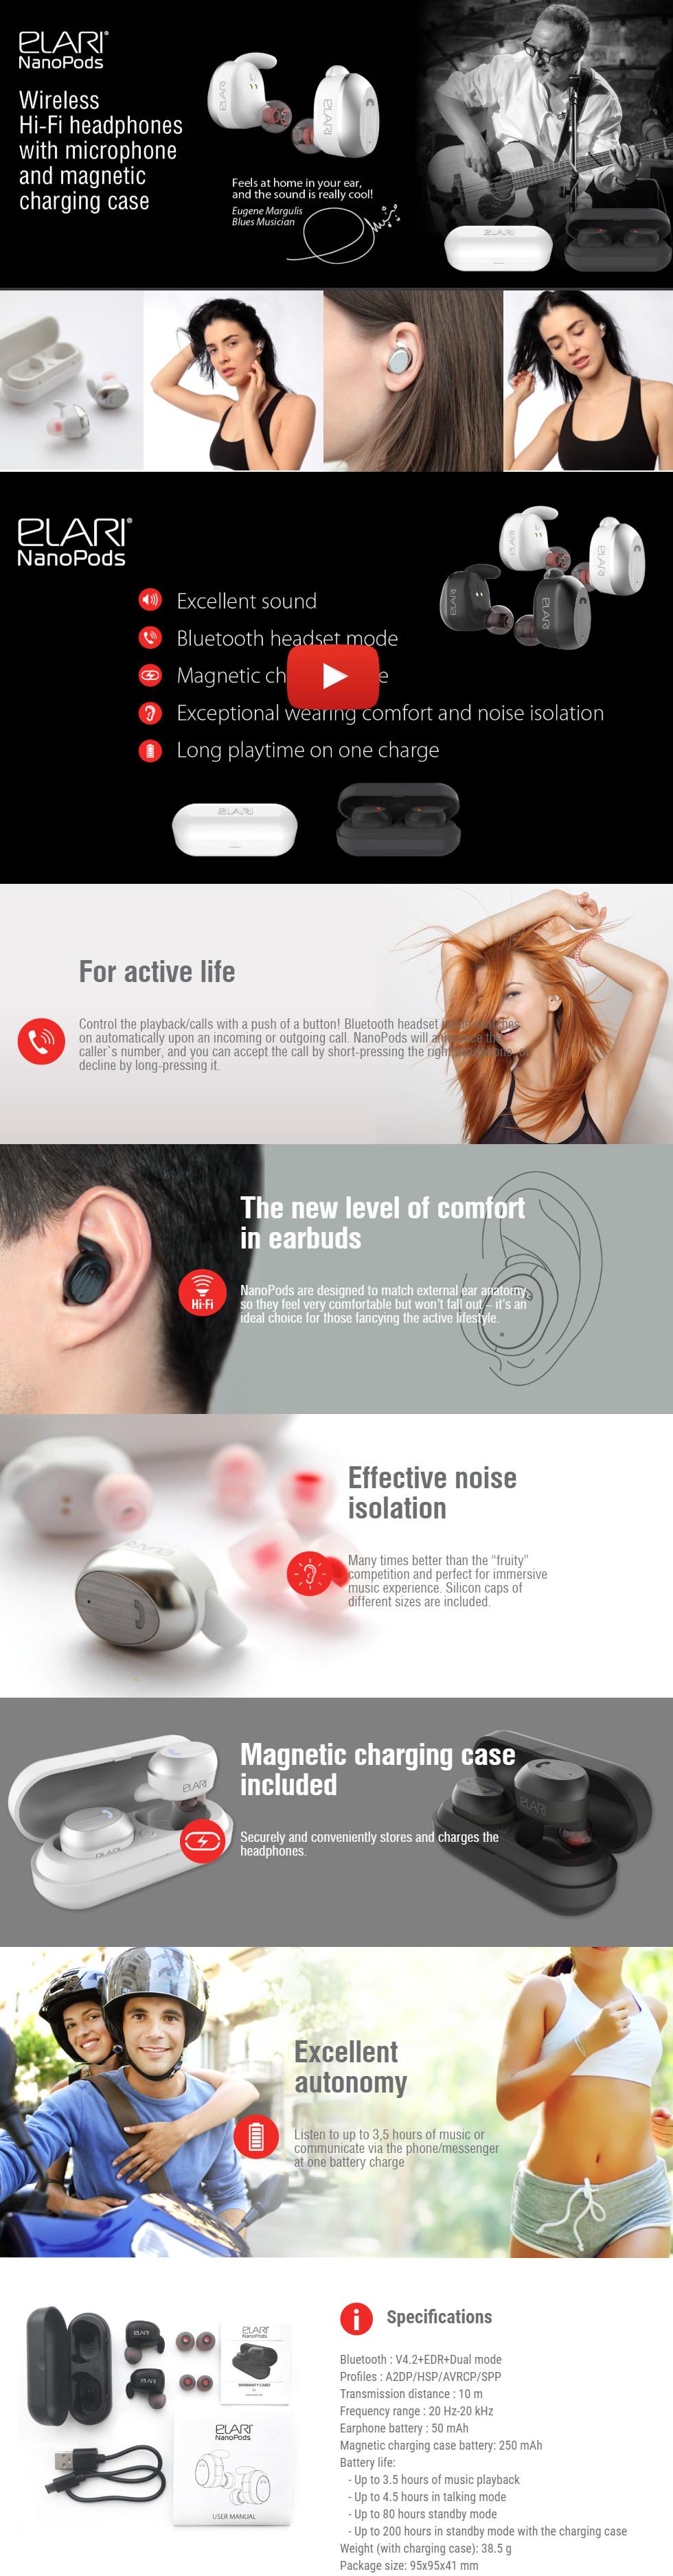 Elari NanoPods Wireless Earbuds Black    Наушники    Наушники ... dda3752c1f6